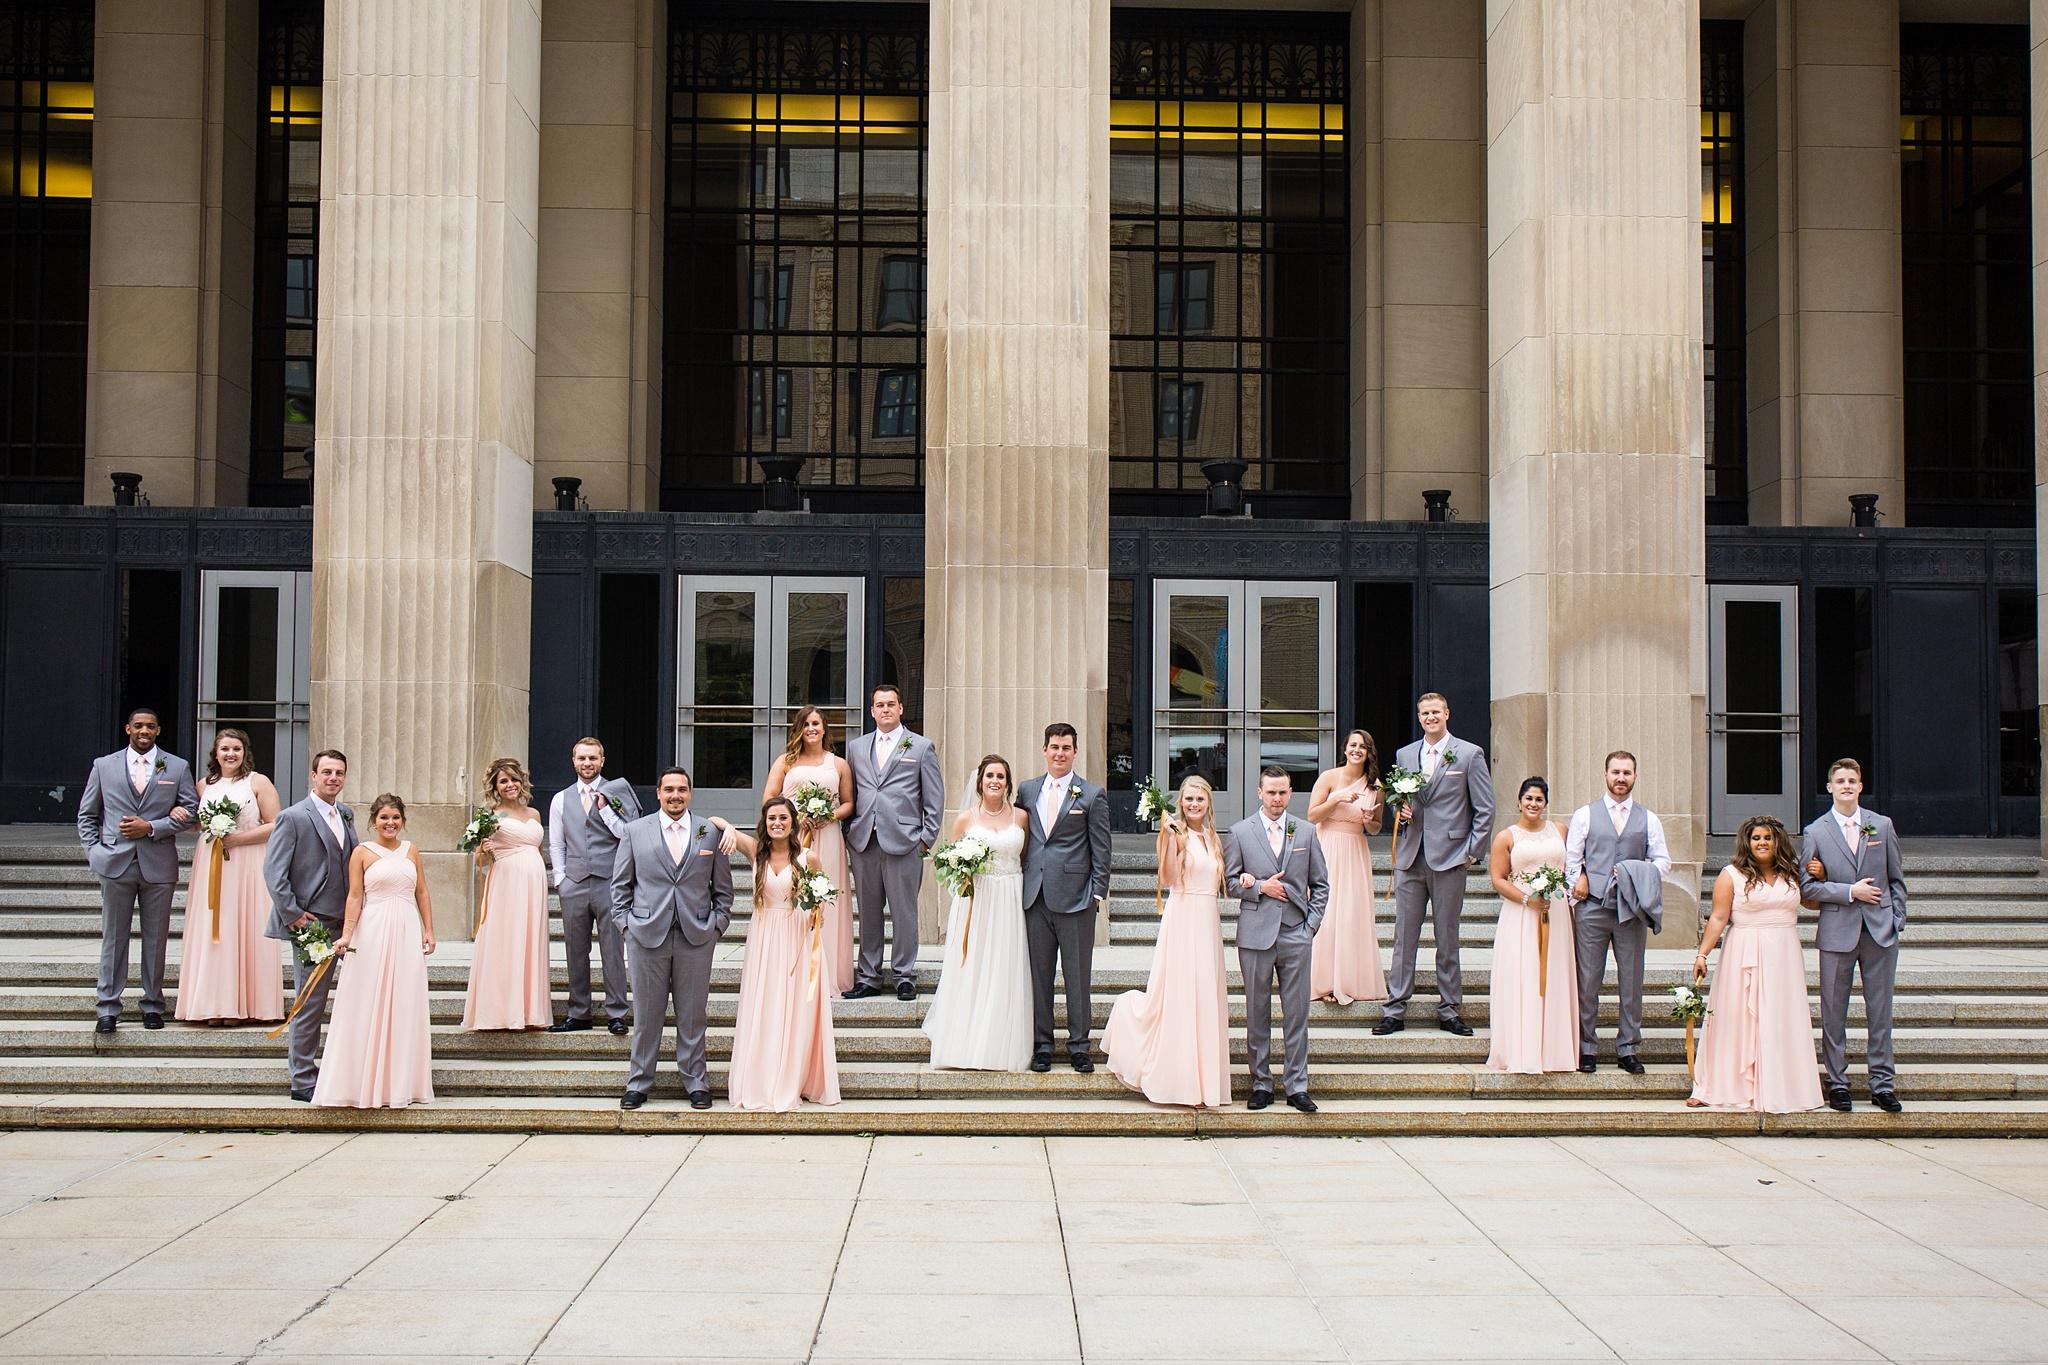 Meghan_Drew_Grand_Rapids_Cheney_place_Wedding038.JPG